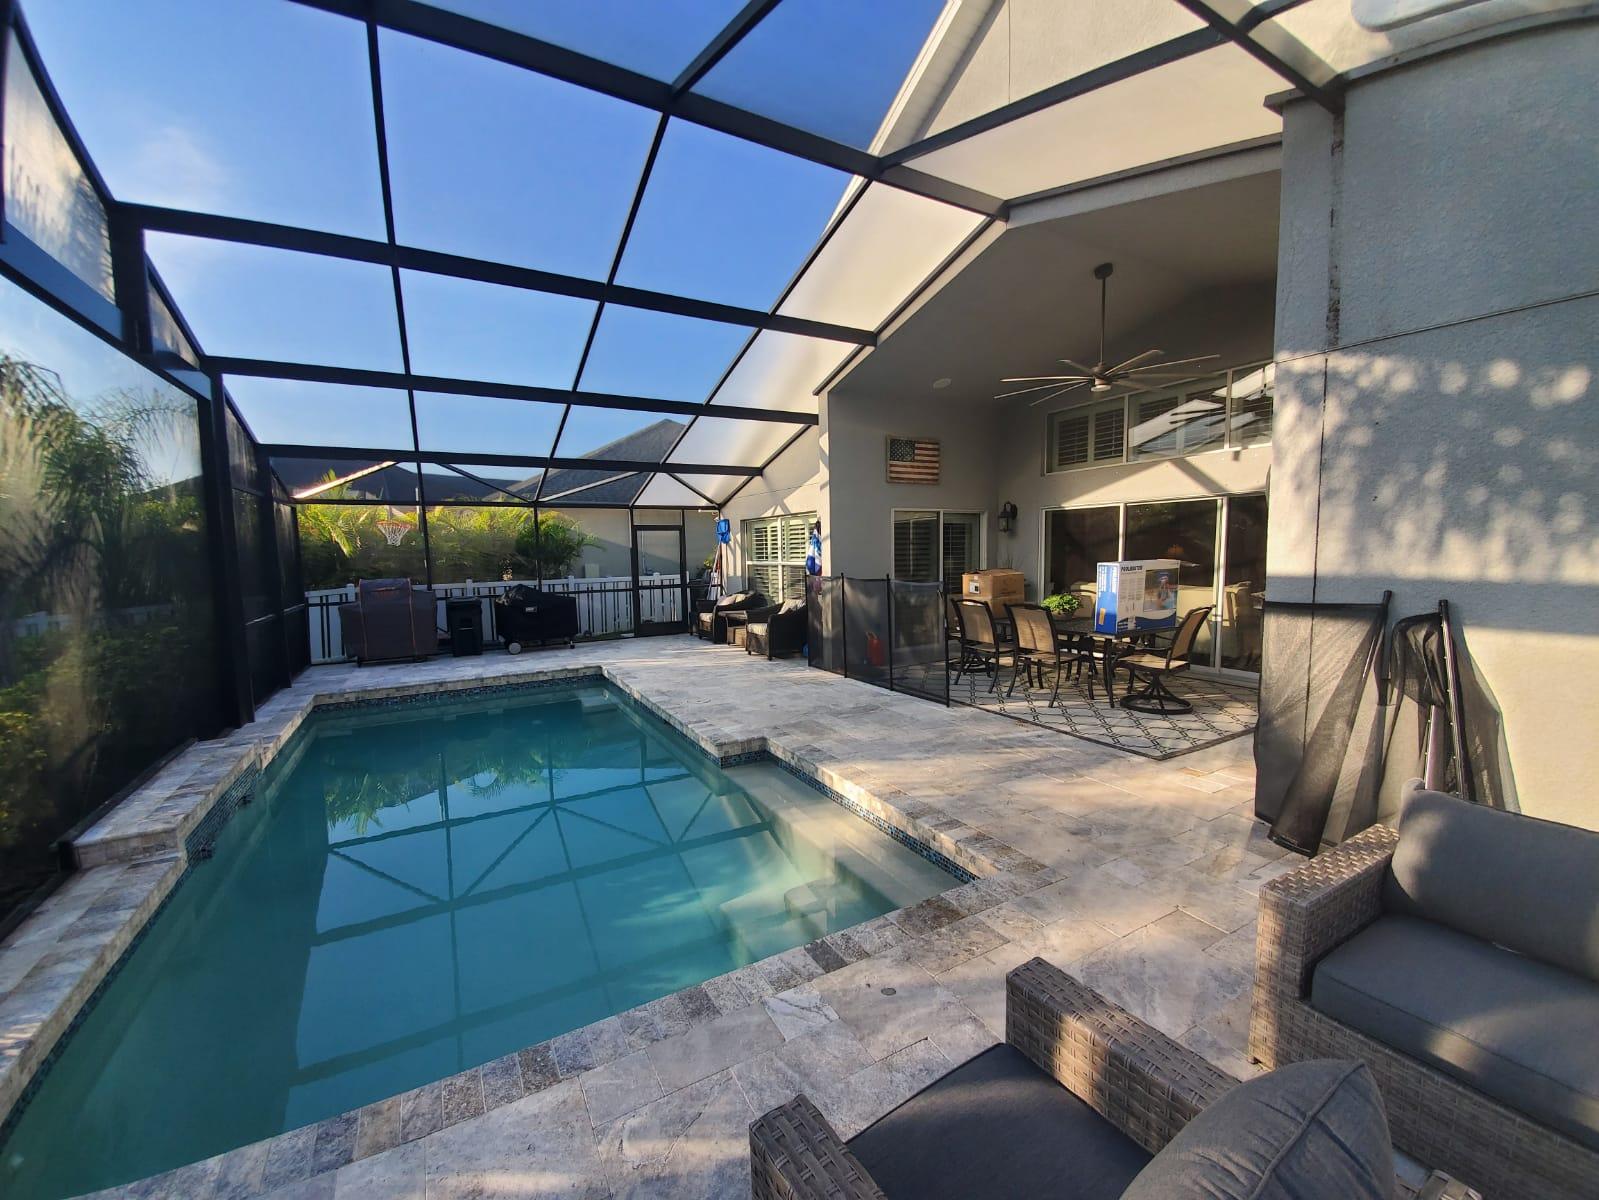 Travertine New Pool Enclosure